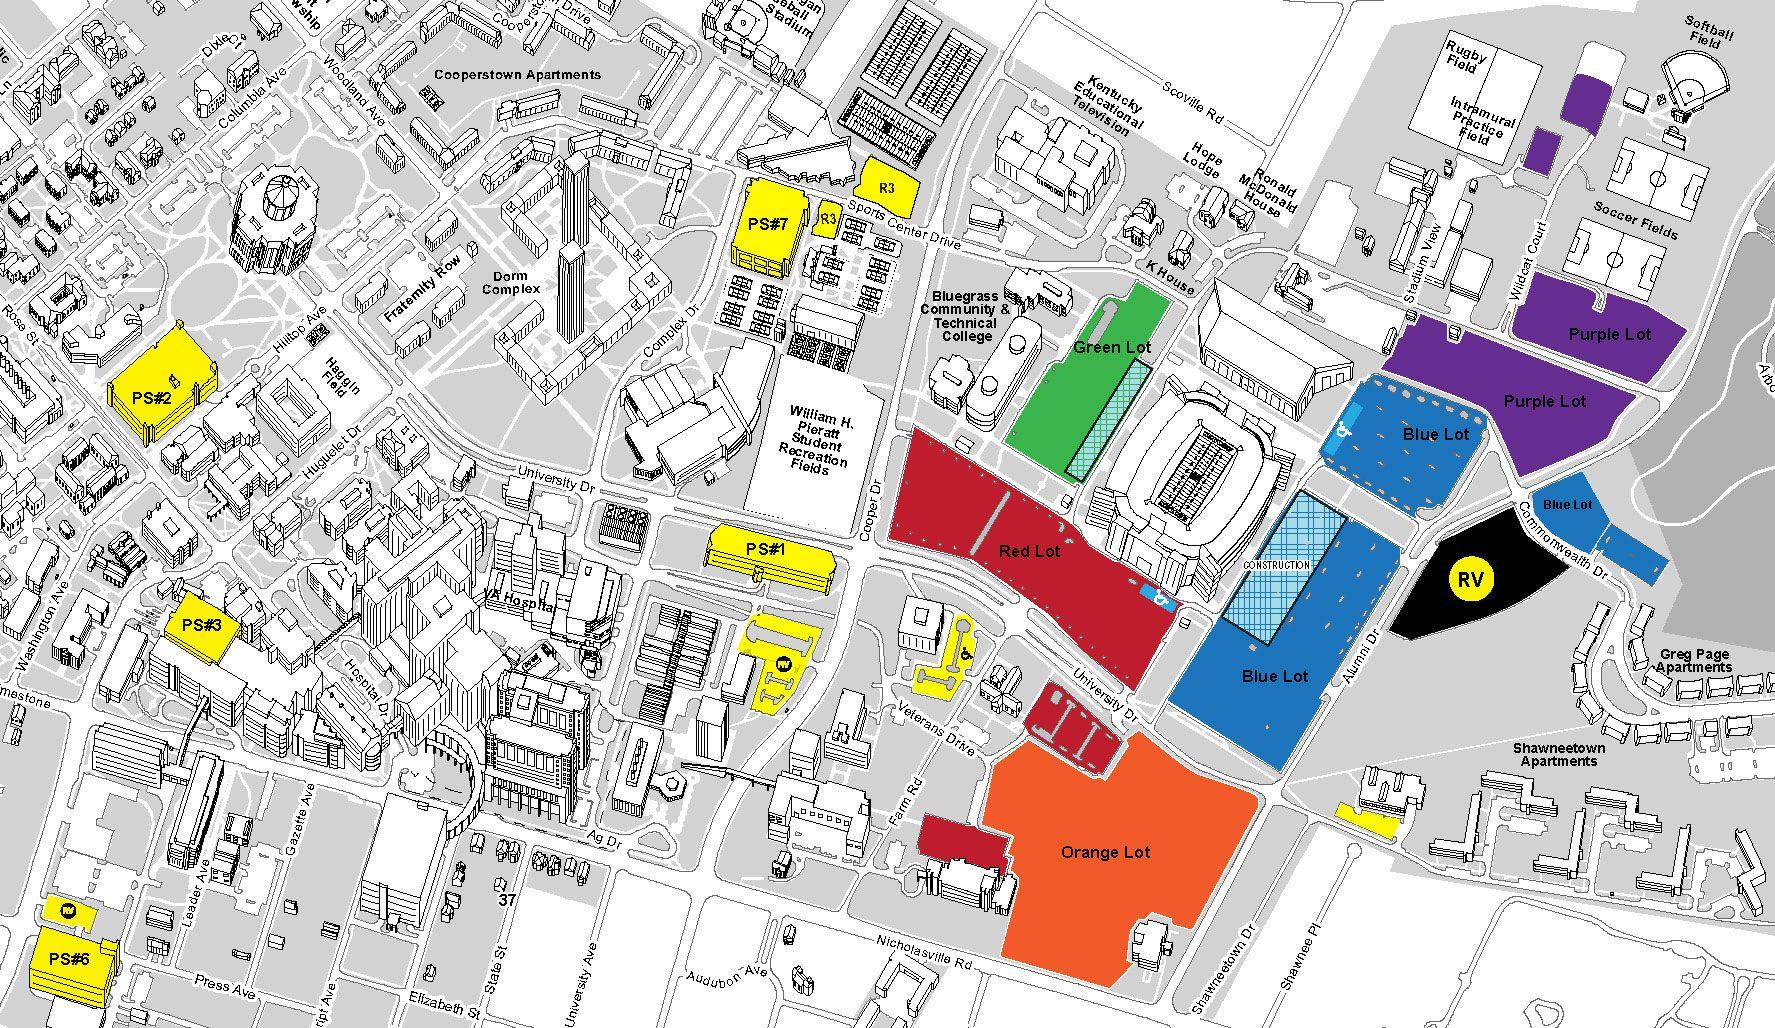 Uk Parking Map UK parking map | University of Kentucky | Map, University of